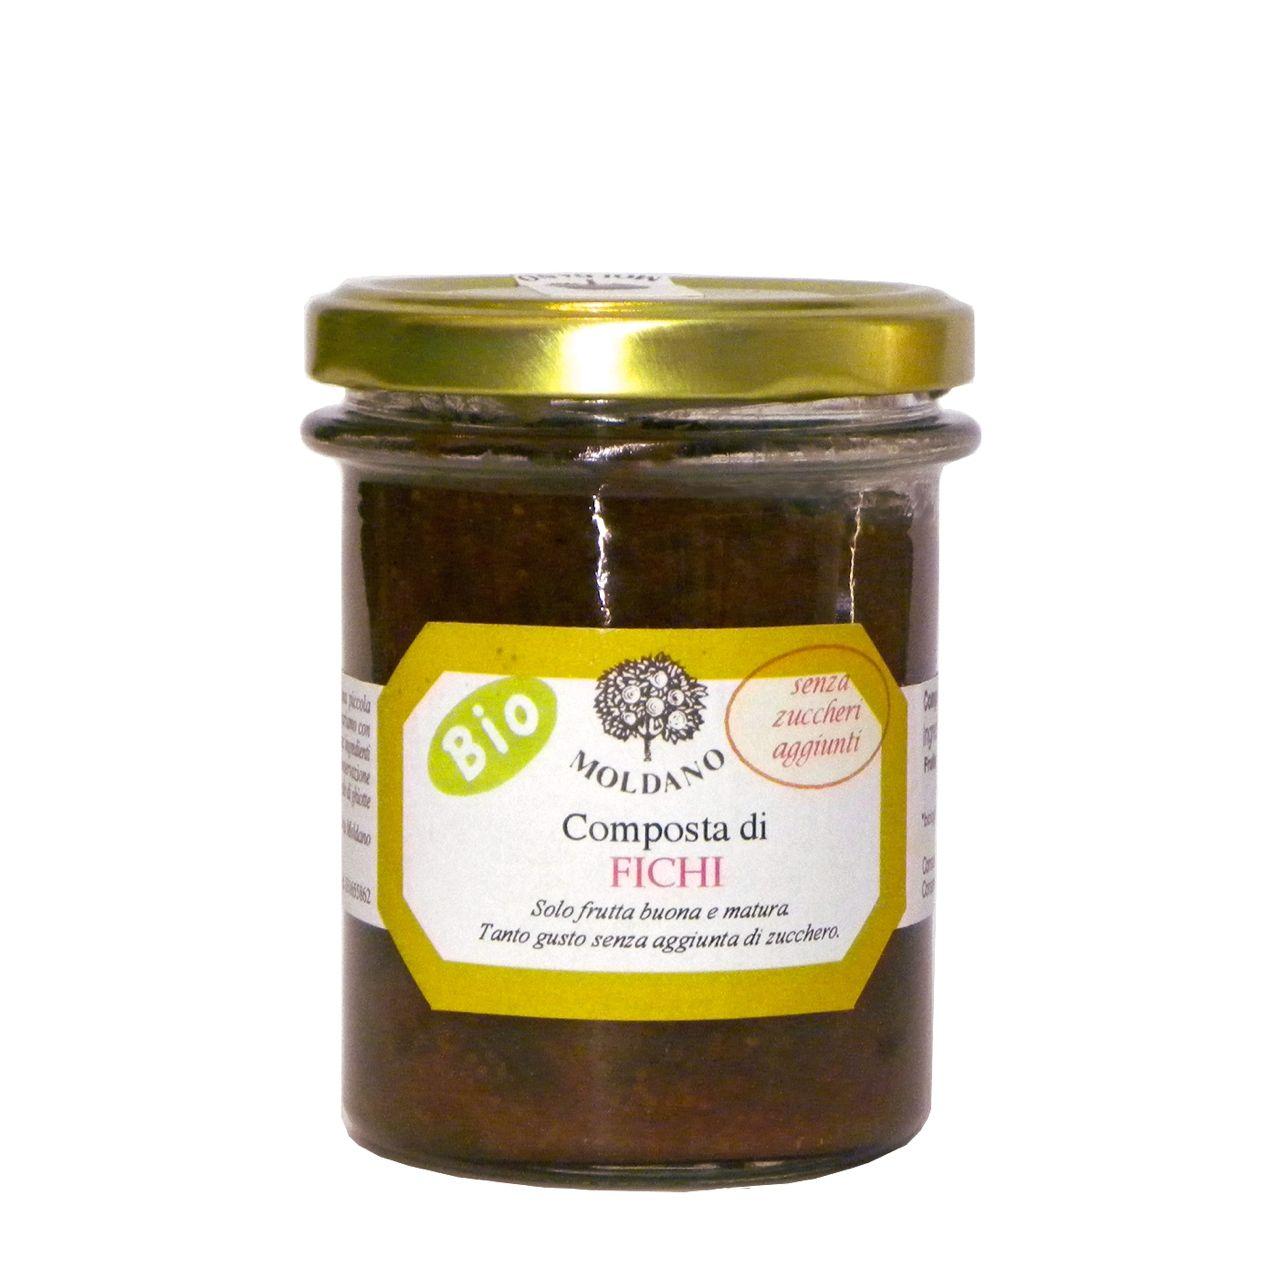 Composta fichi Bio Moldano 190 g – No sugar added organic fig jam – Gustorotondo – Italian Food Boutique – Versione 2